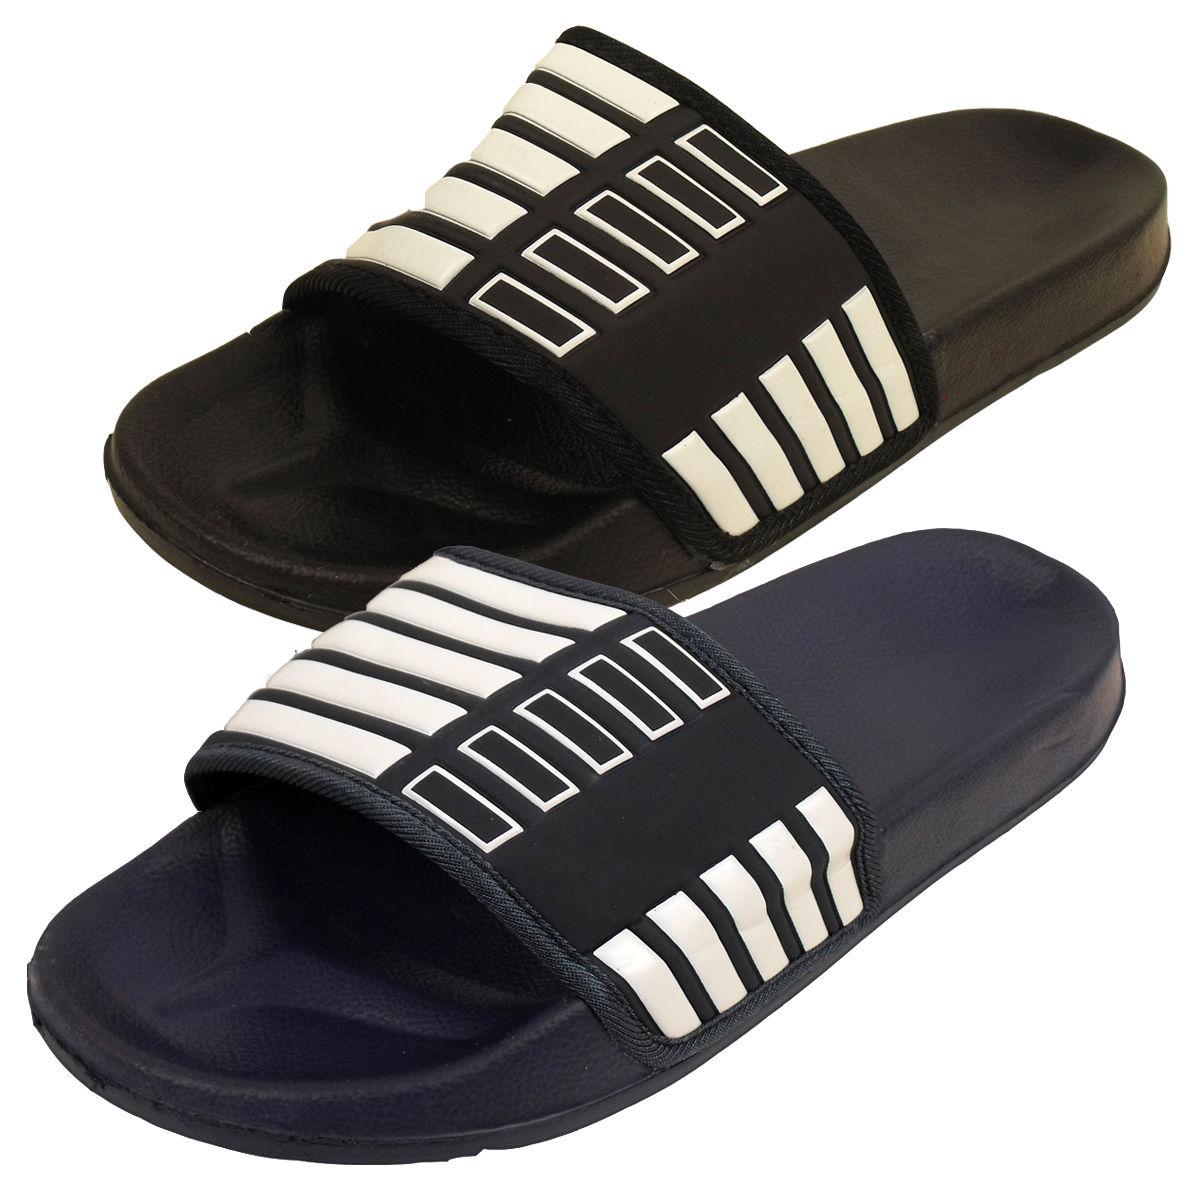 903d031f689 Mens Slide Mules Sandals Pool Beach Water Flip Flop Flops Sandal Shower  Shoes